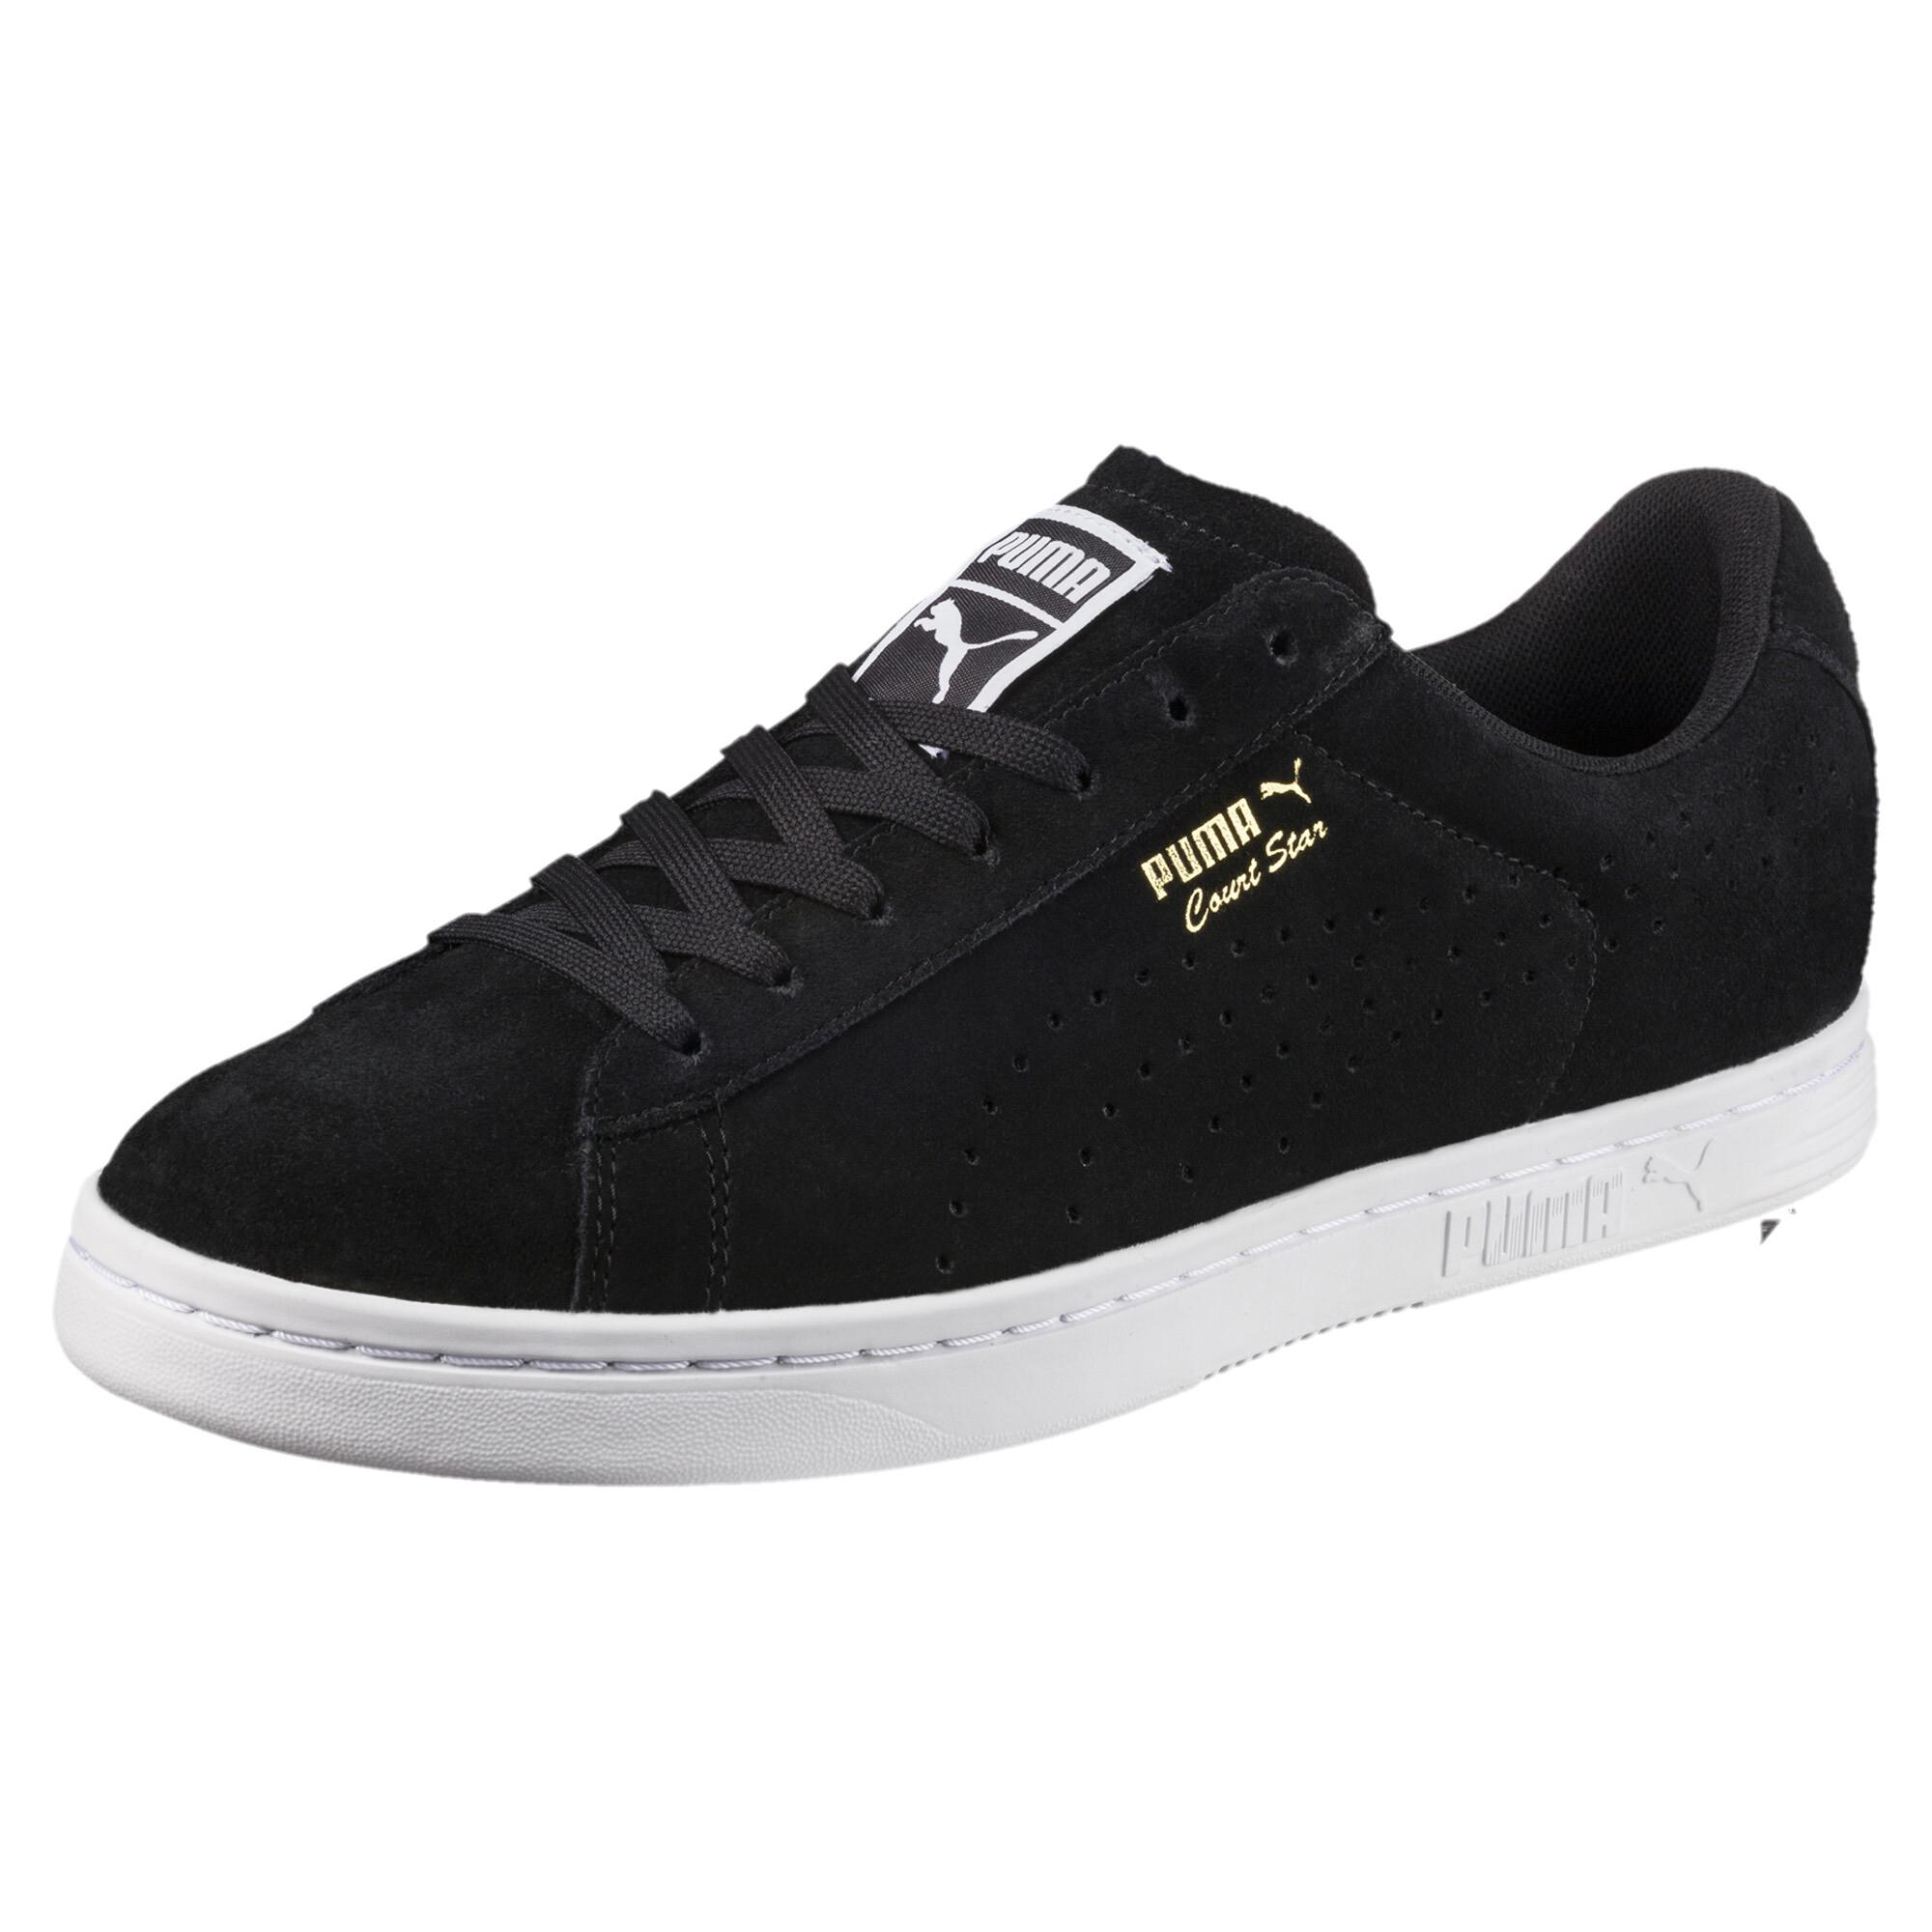 PUMA-Court-Star-Suede-Sneakers-Unisex-Shoe-Sport-Classics thumbnail 16